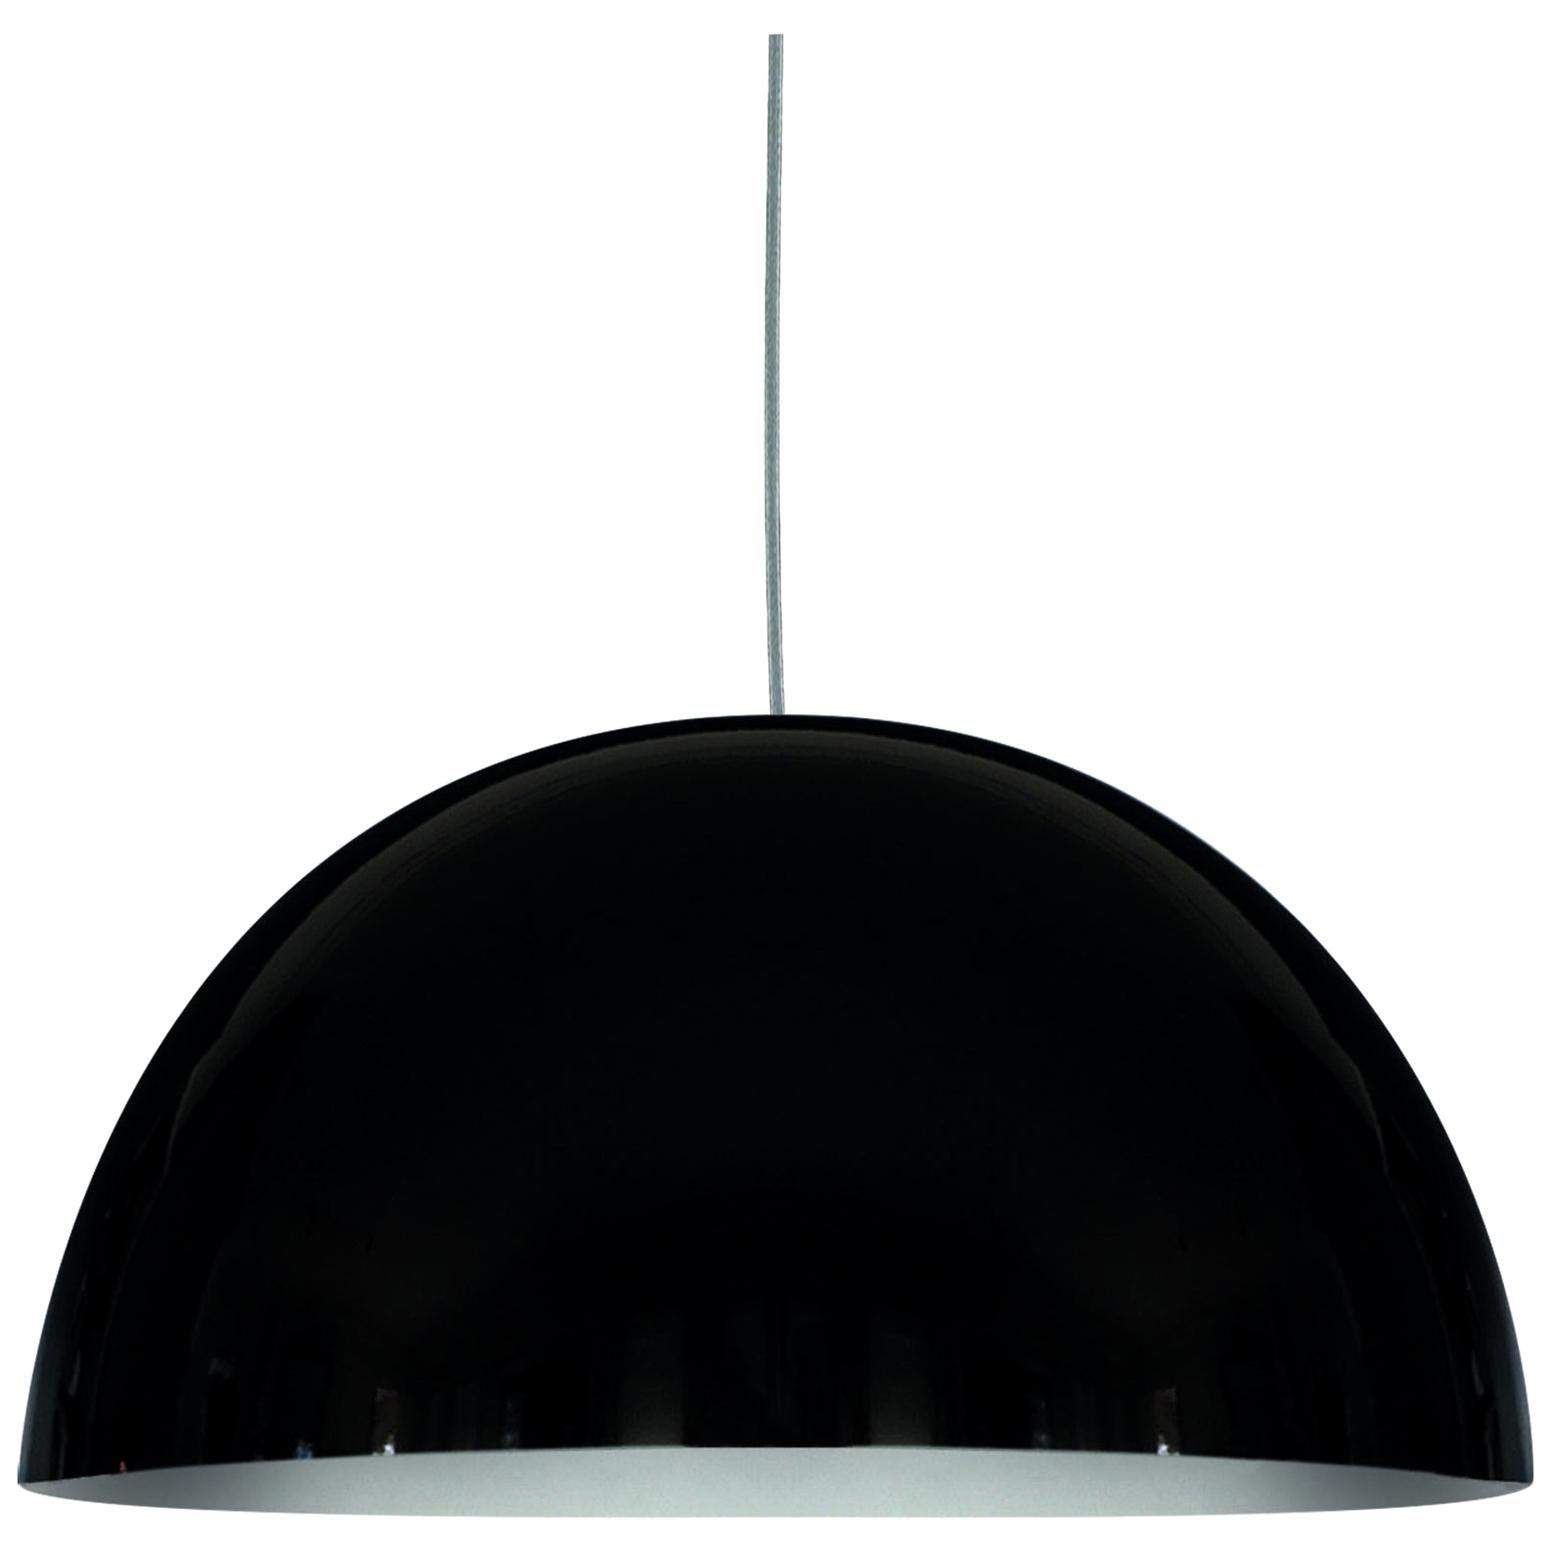 Vico Magistretti Suspension Lamps 'Sonora' Large Black by Oluce